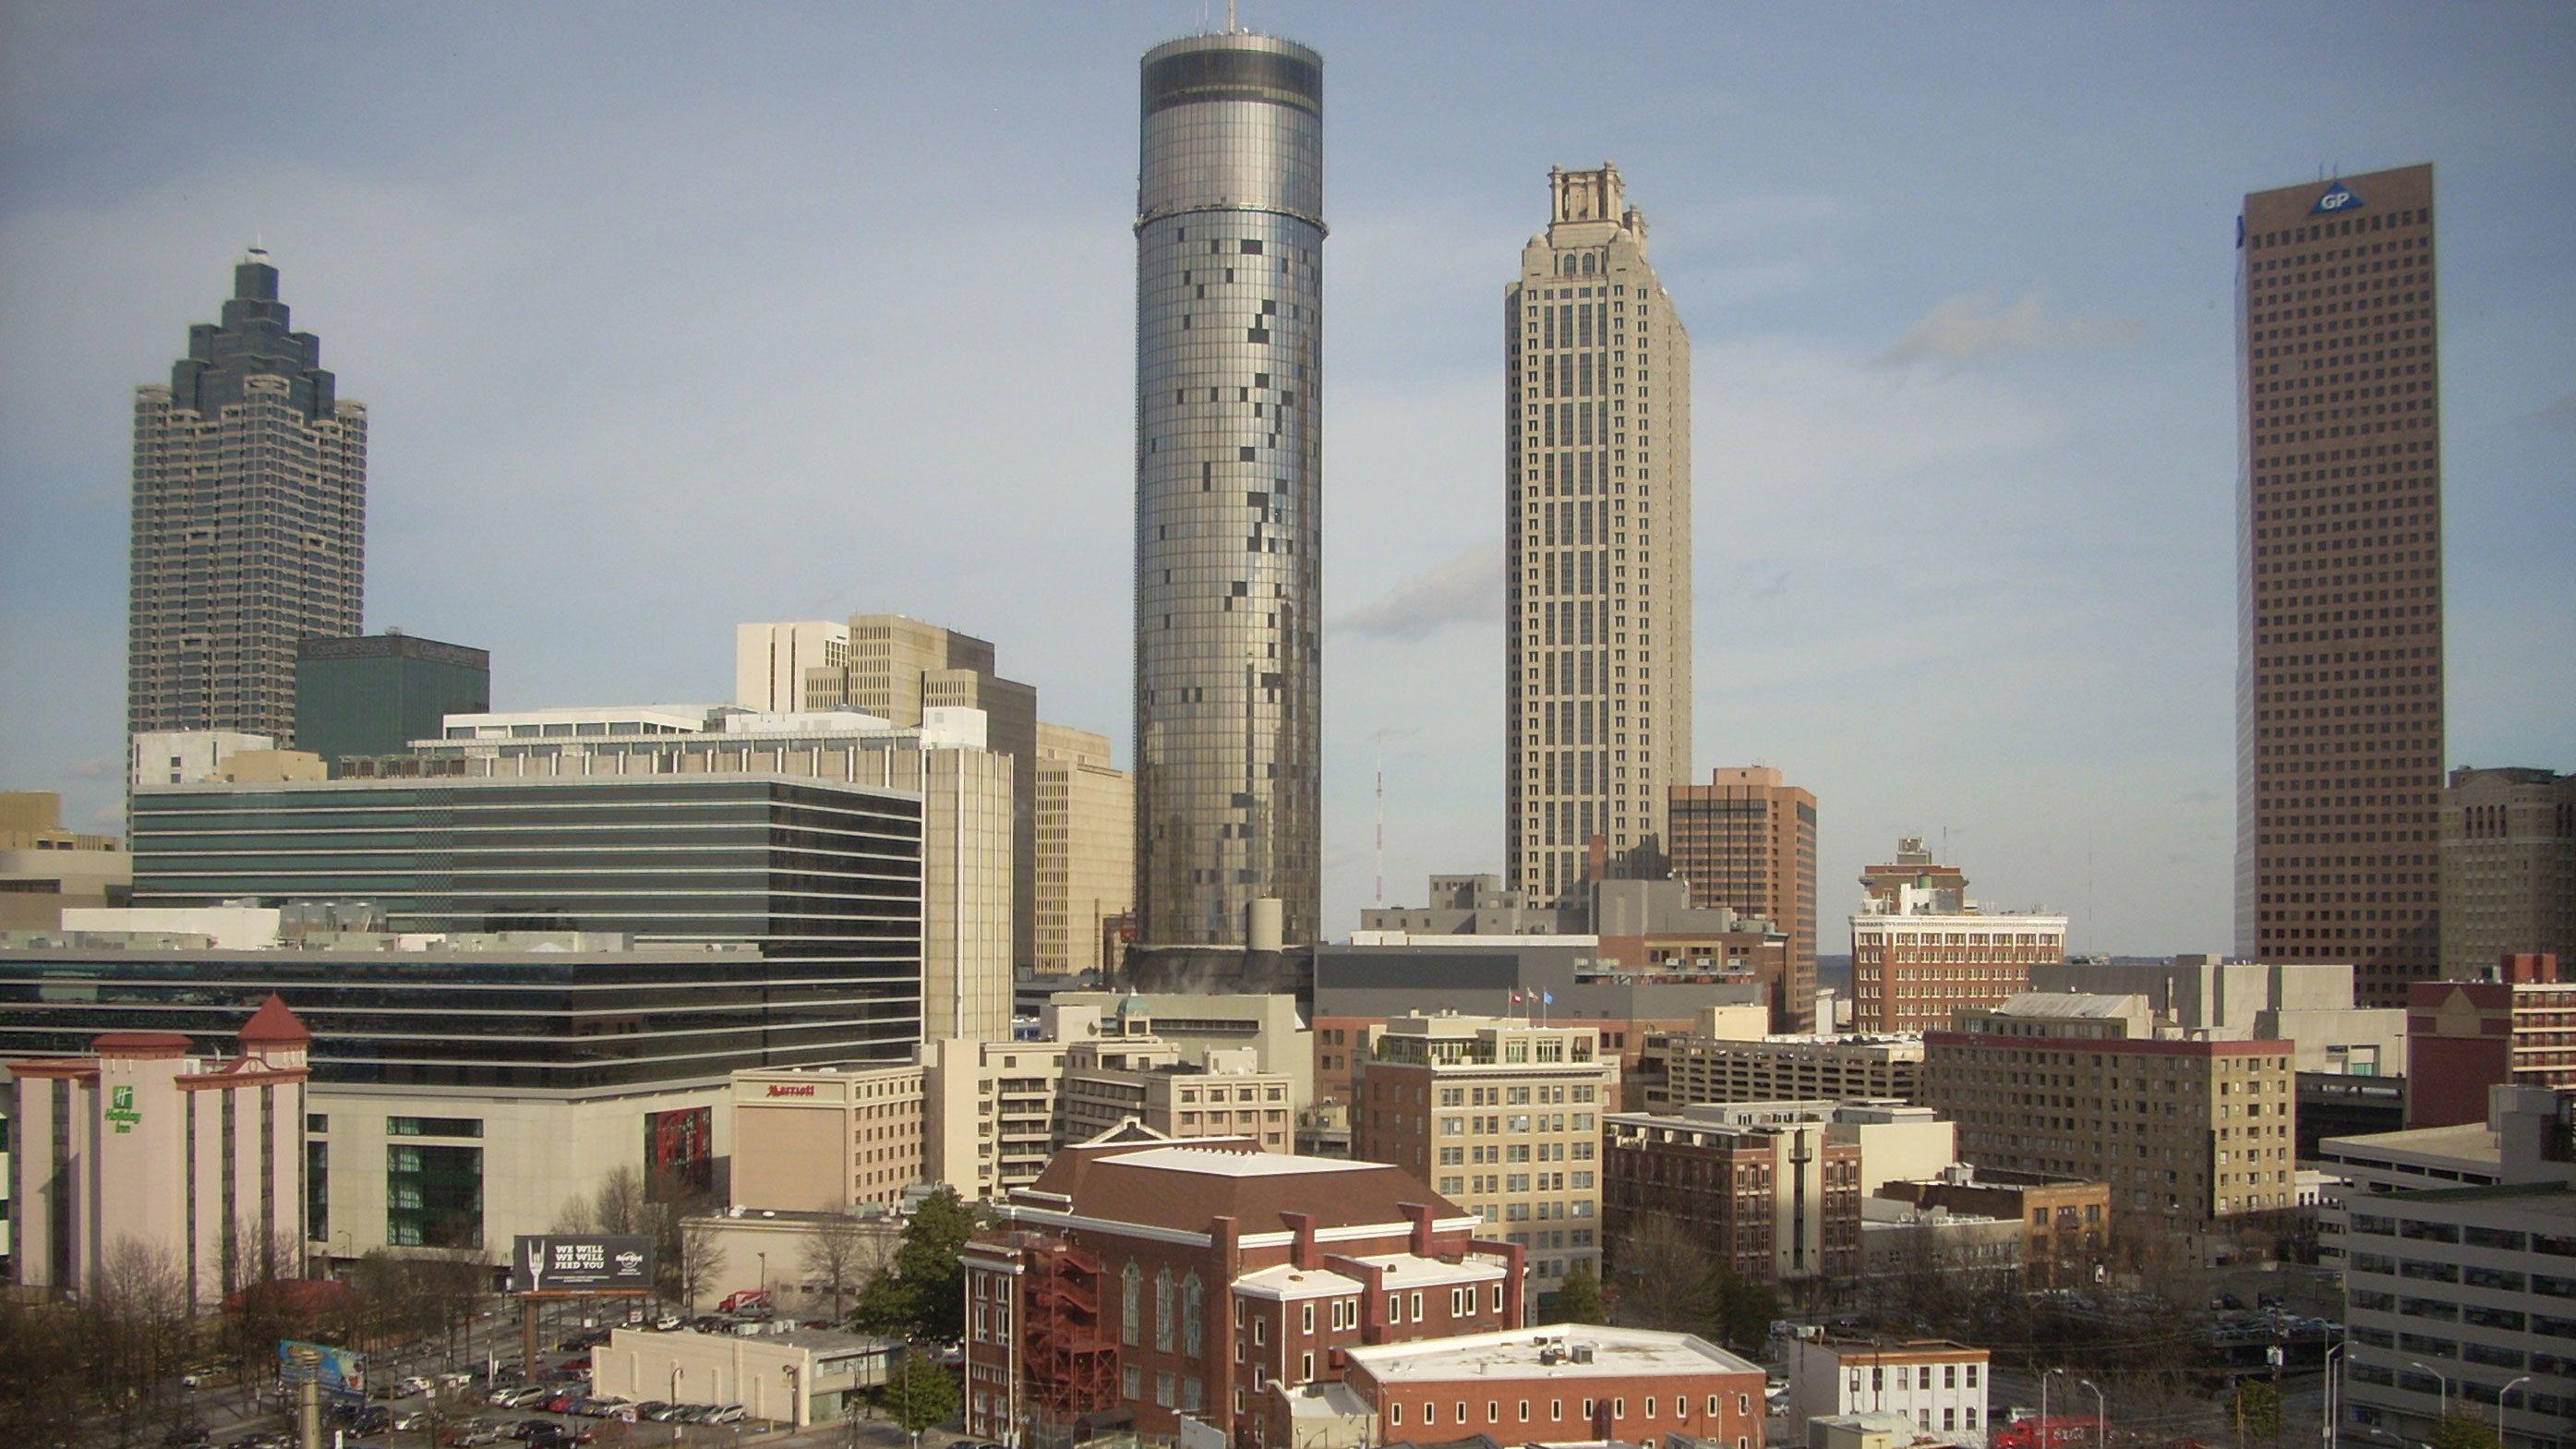 Skyline of Atlanta Georgia in the afternoon